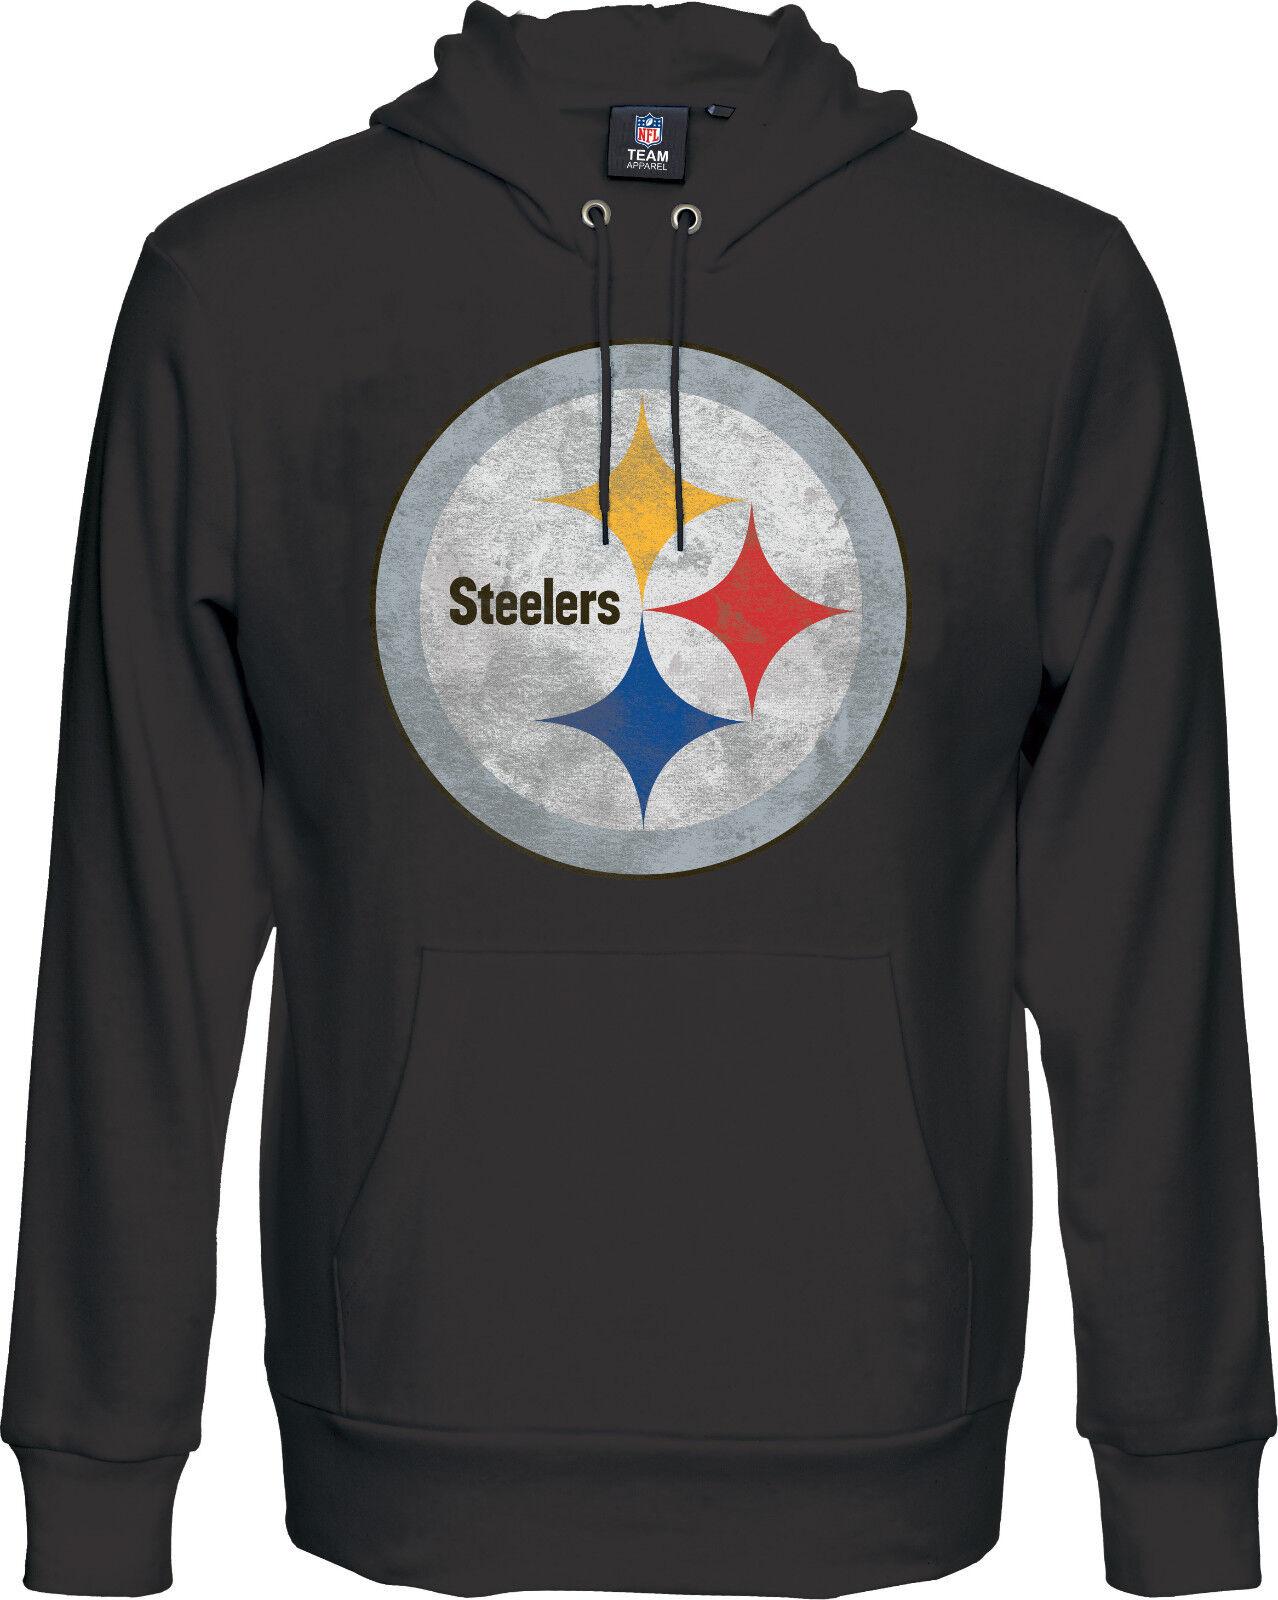 NFL FOOTBALL Pittsburgh Steelers Hoody kaputzenpullover HYPER Domestic SWEATER